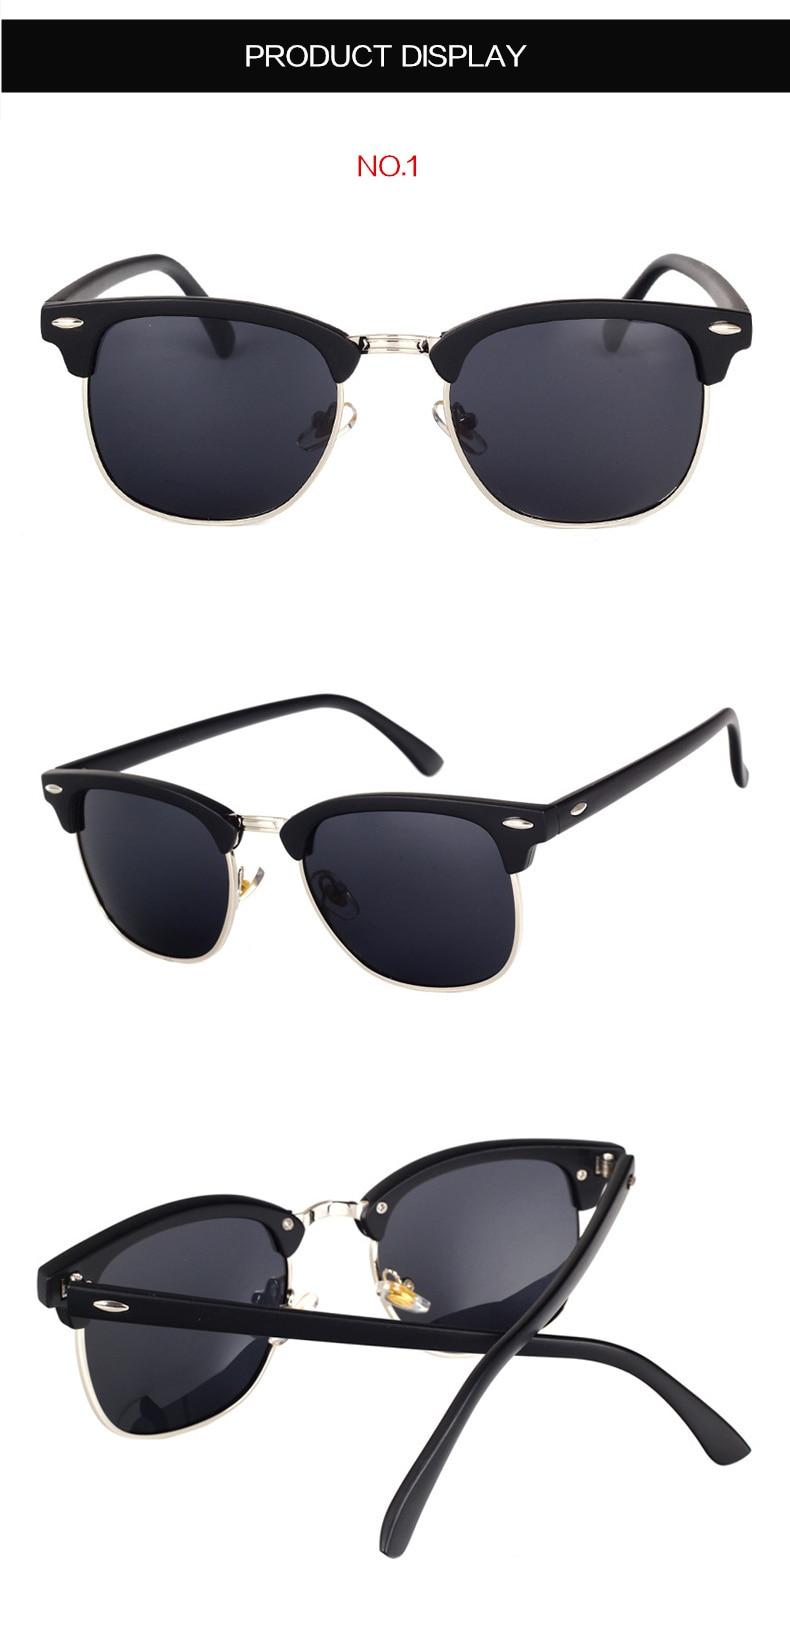 HTB1cHaaXz3z9KJjy0Fmq6xiwXXap - YOOSKE Classic Polarized Sunglasses Men Women Retro Brand Designer High Quality Sun Glasses Female Male Fashion Mirror Sunglass